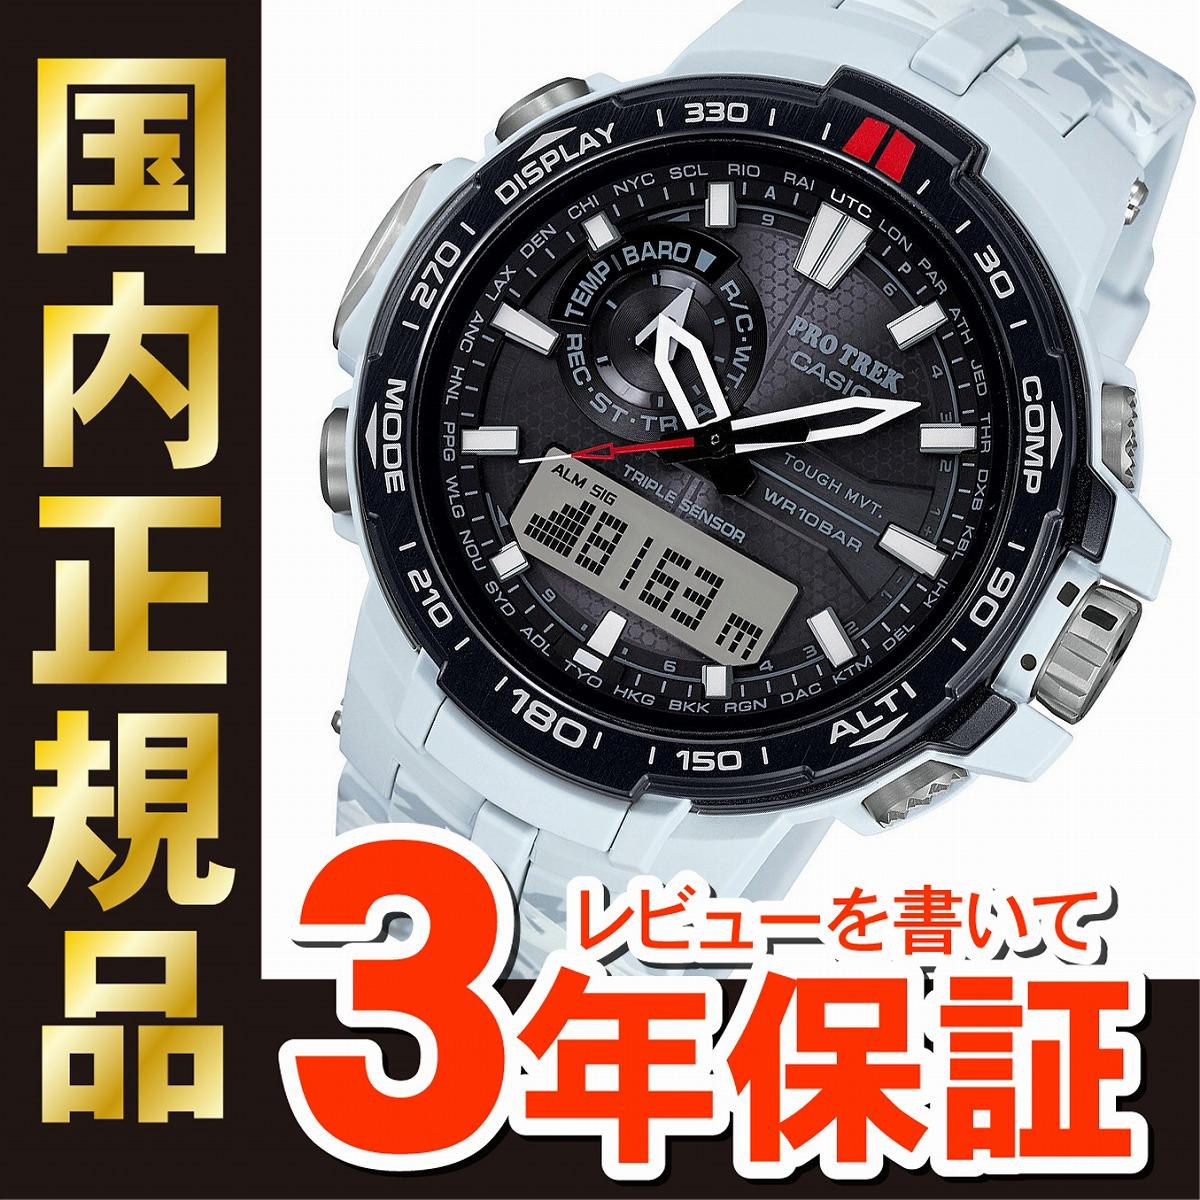 9549ff4ac3 カシオプロトレックCASIOPROTREK電波ソーラー電波時計腕時計メンズアナデジタフソーラーPRW-6000YT